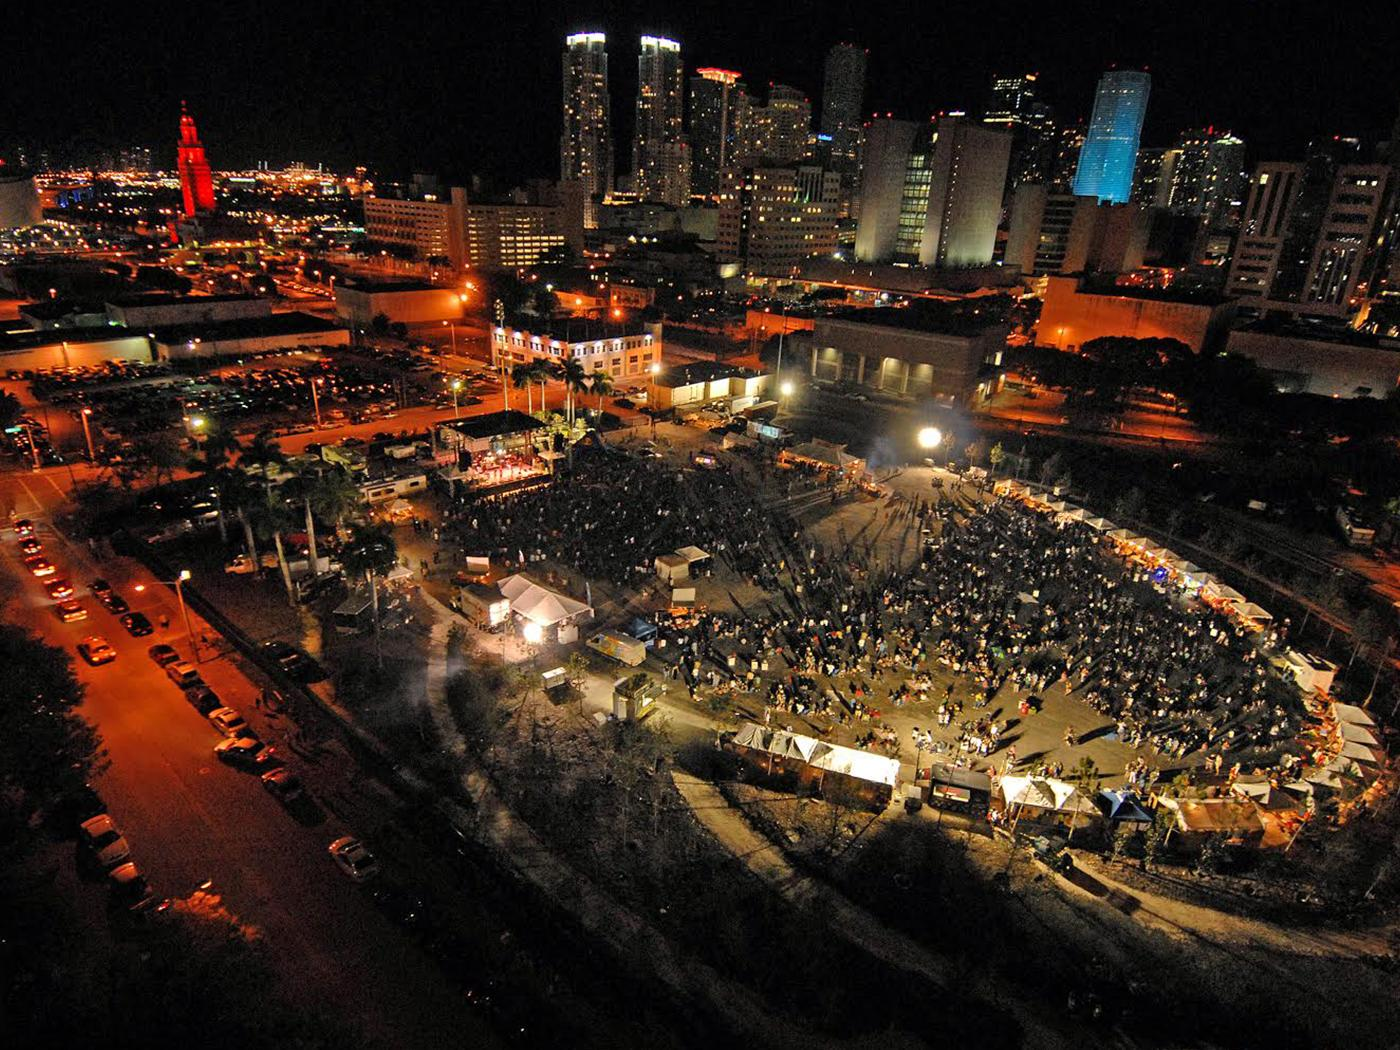 Miami Grand Central Park at night